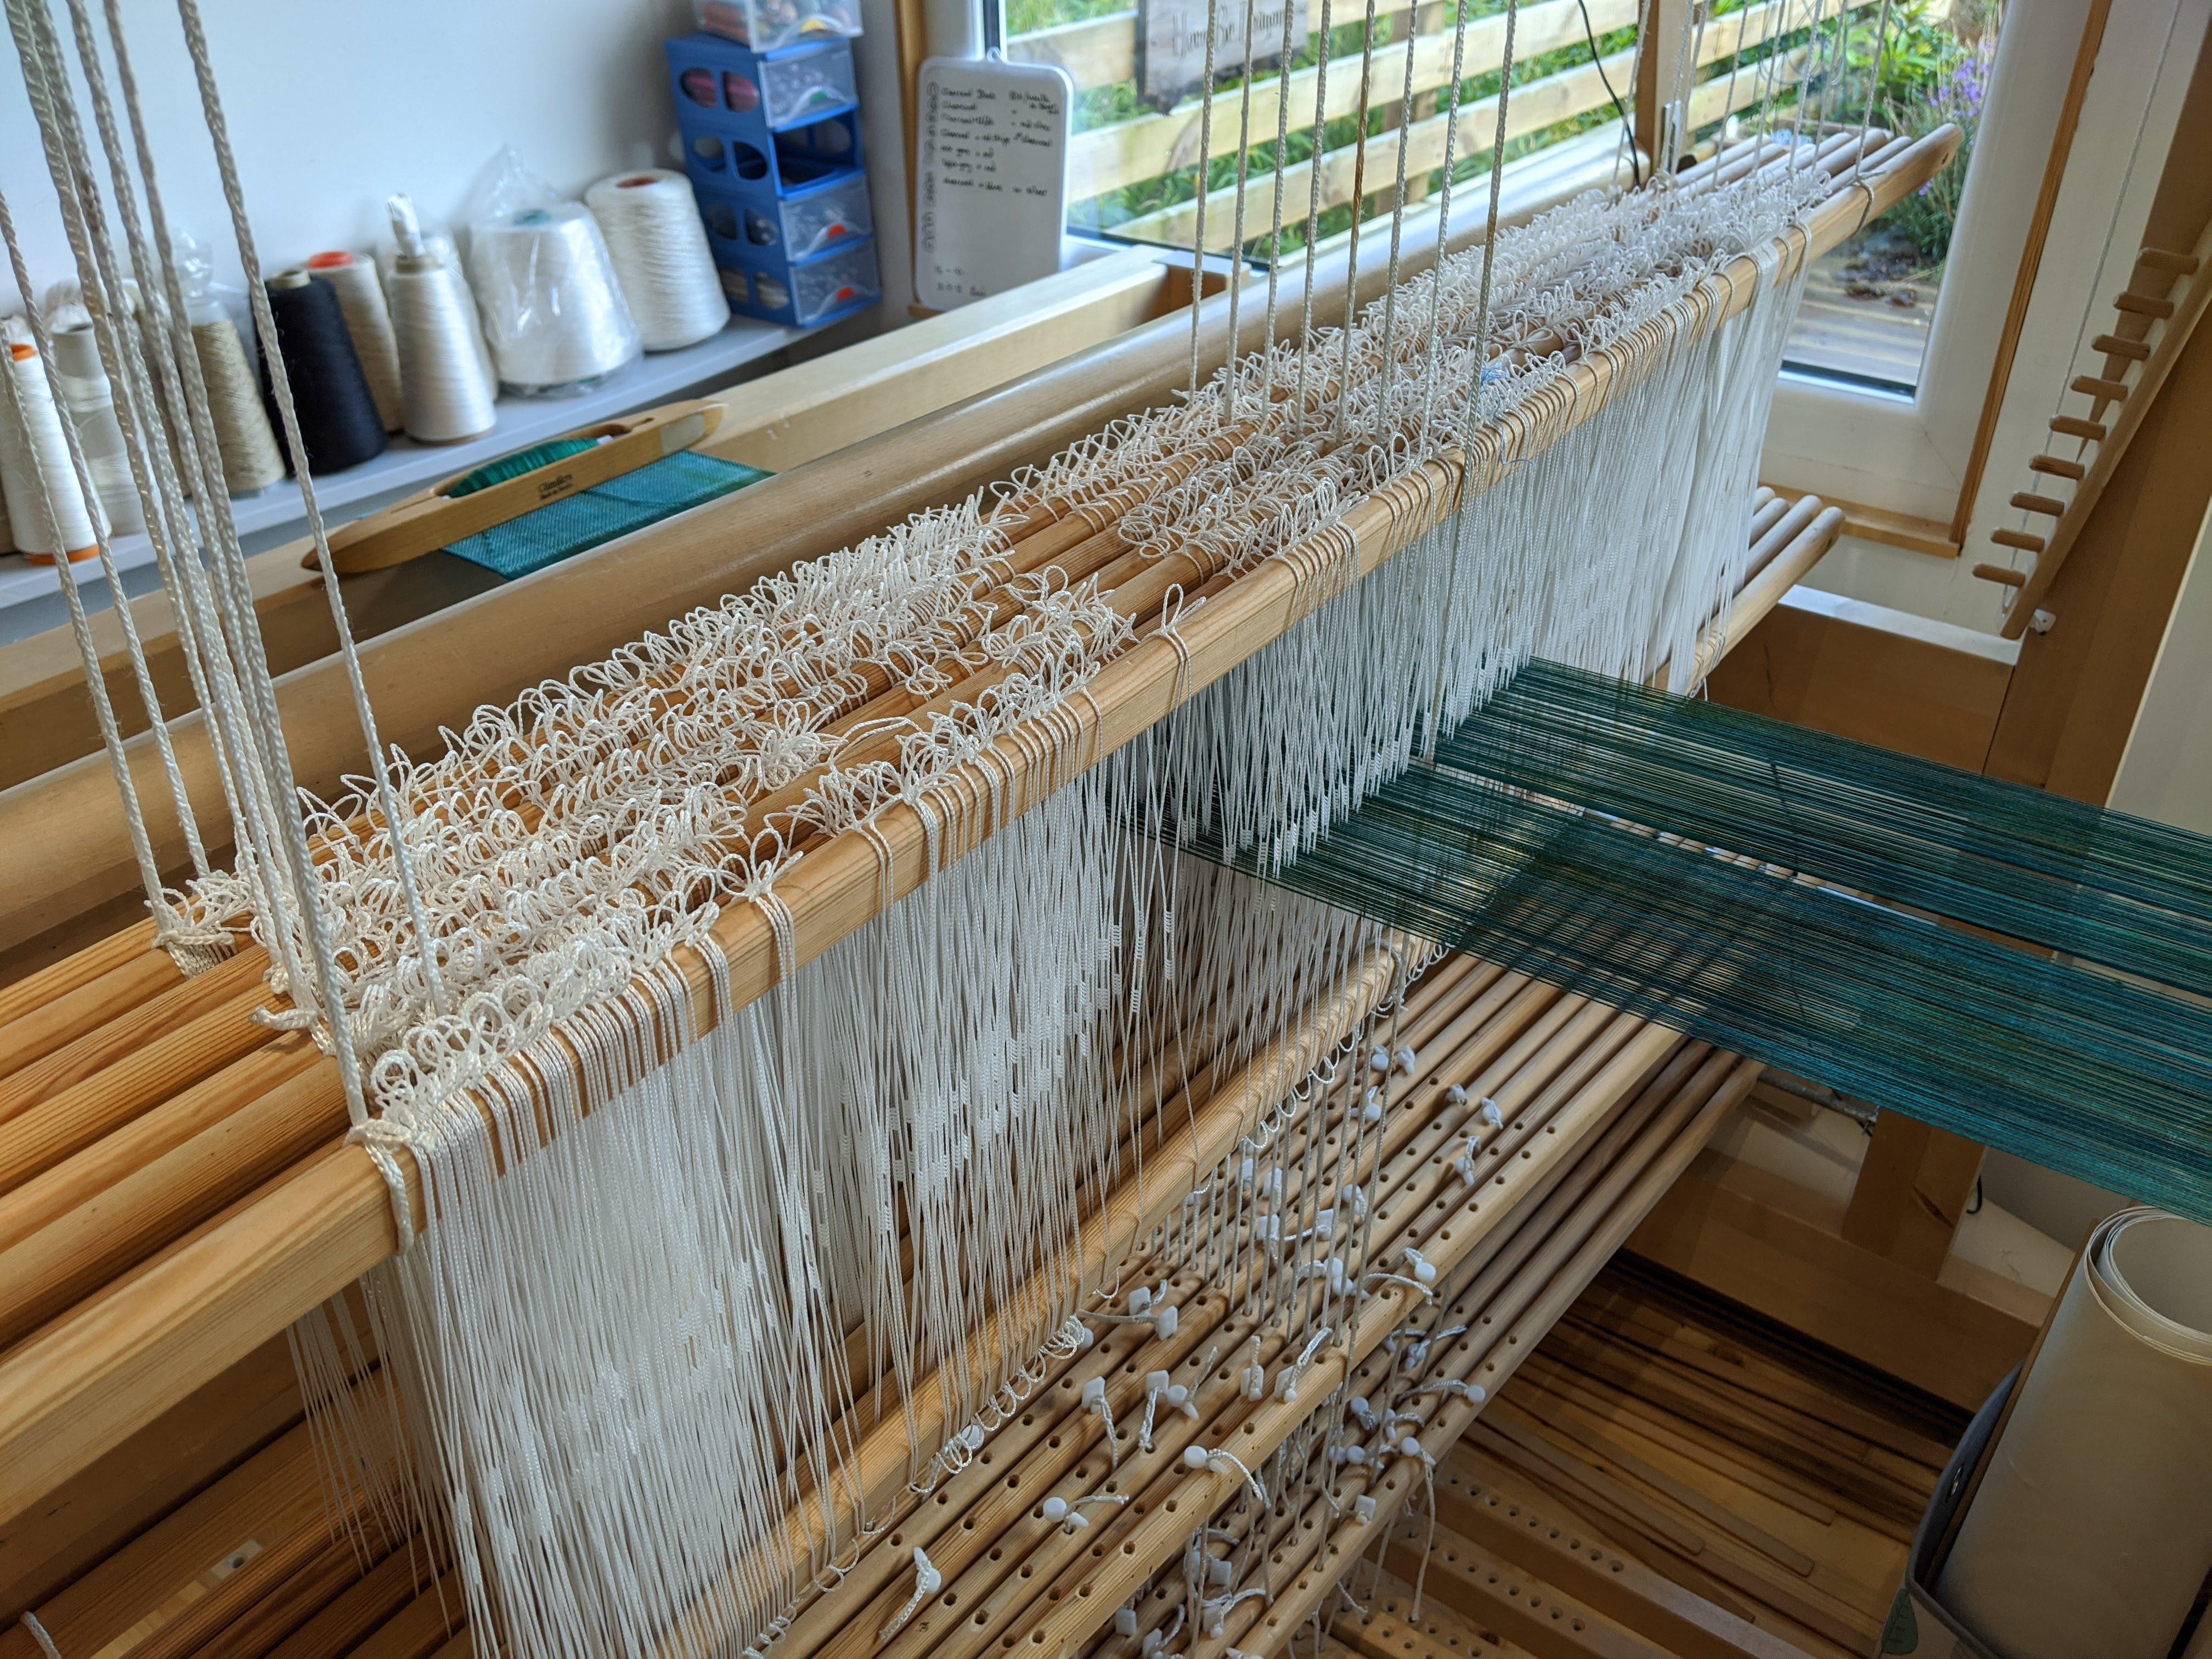 Isle of Skye Textile Experience